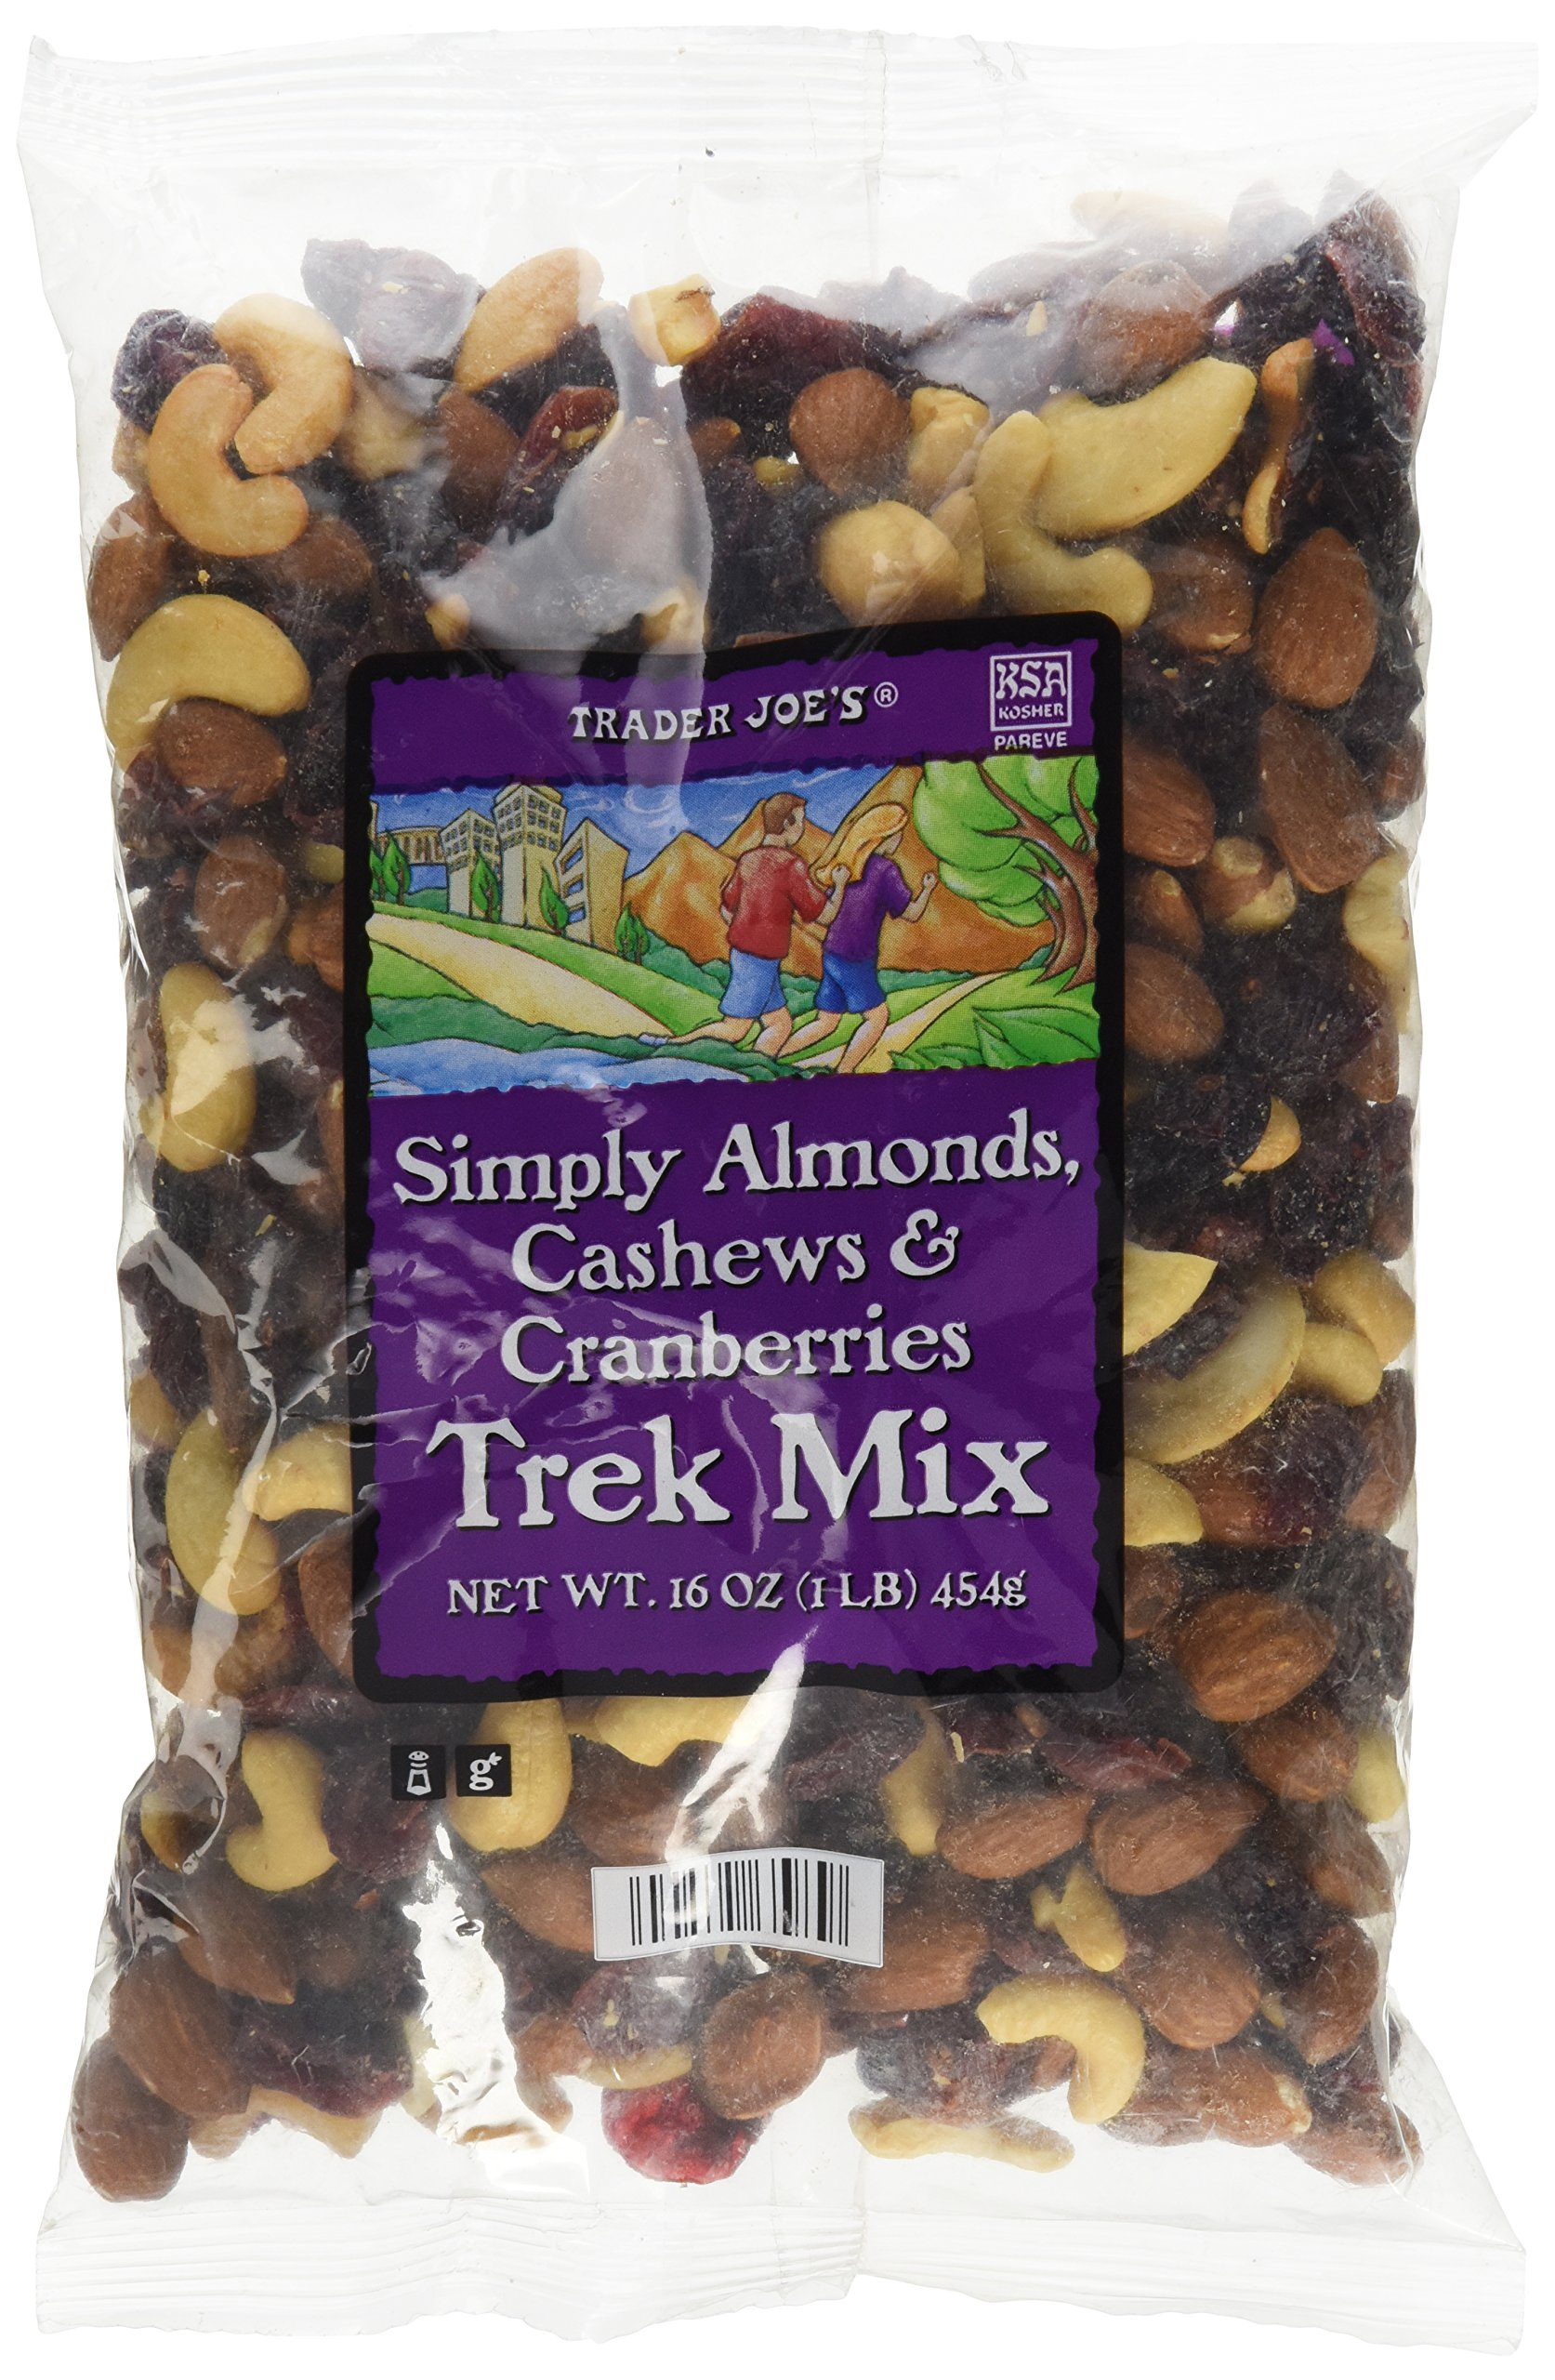 Trader Joe's Simply Almonds, Cashews & Cranberries Trek Mix...16 oz. bag